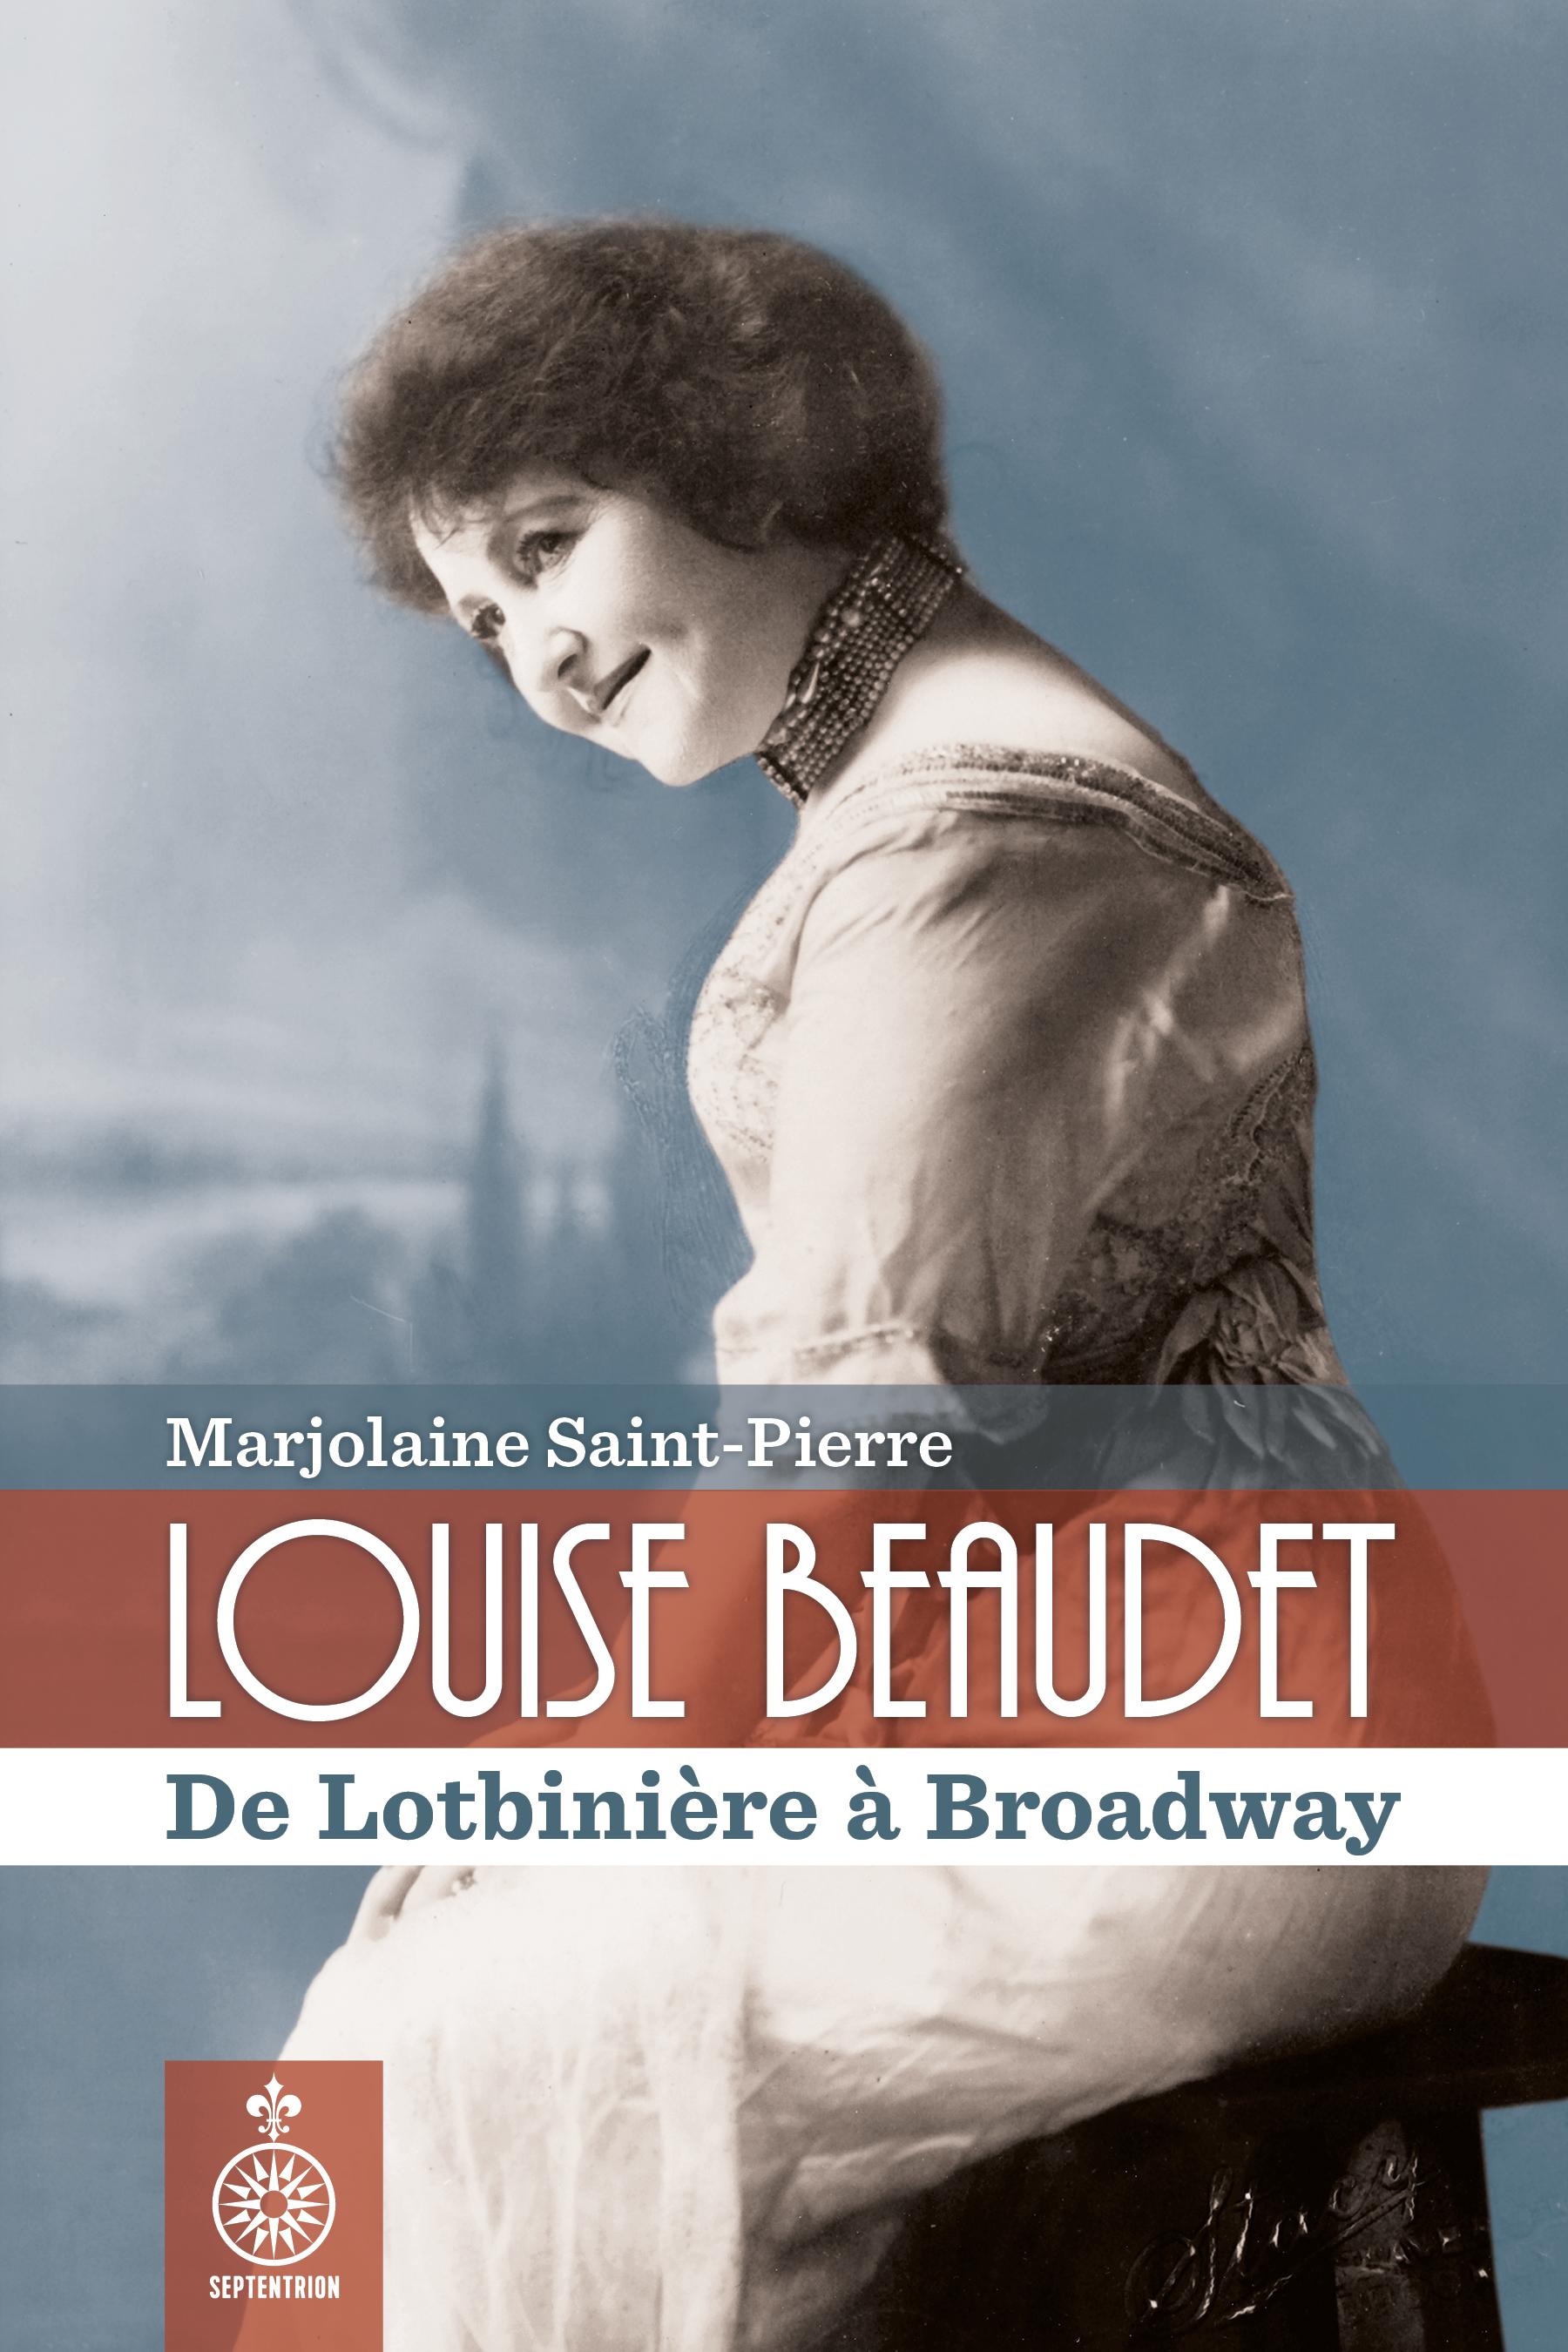 Louise Beaudet